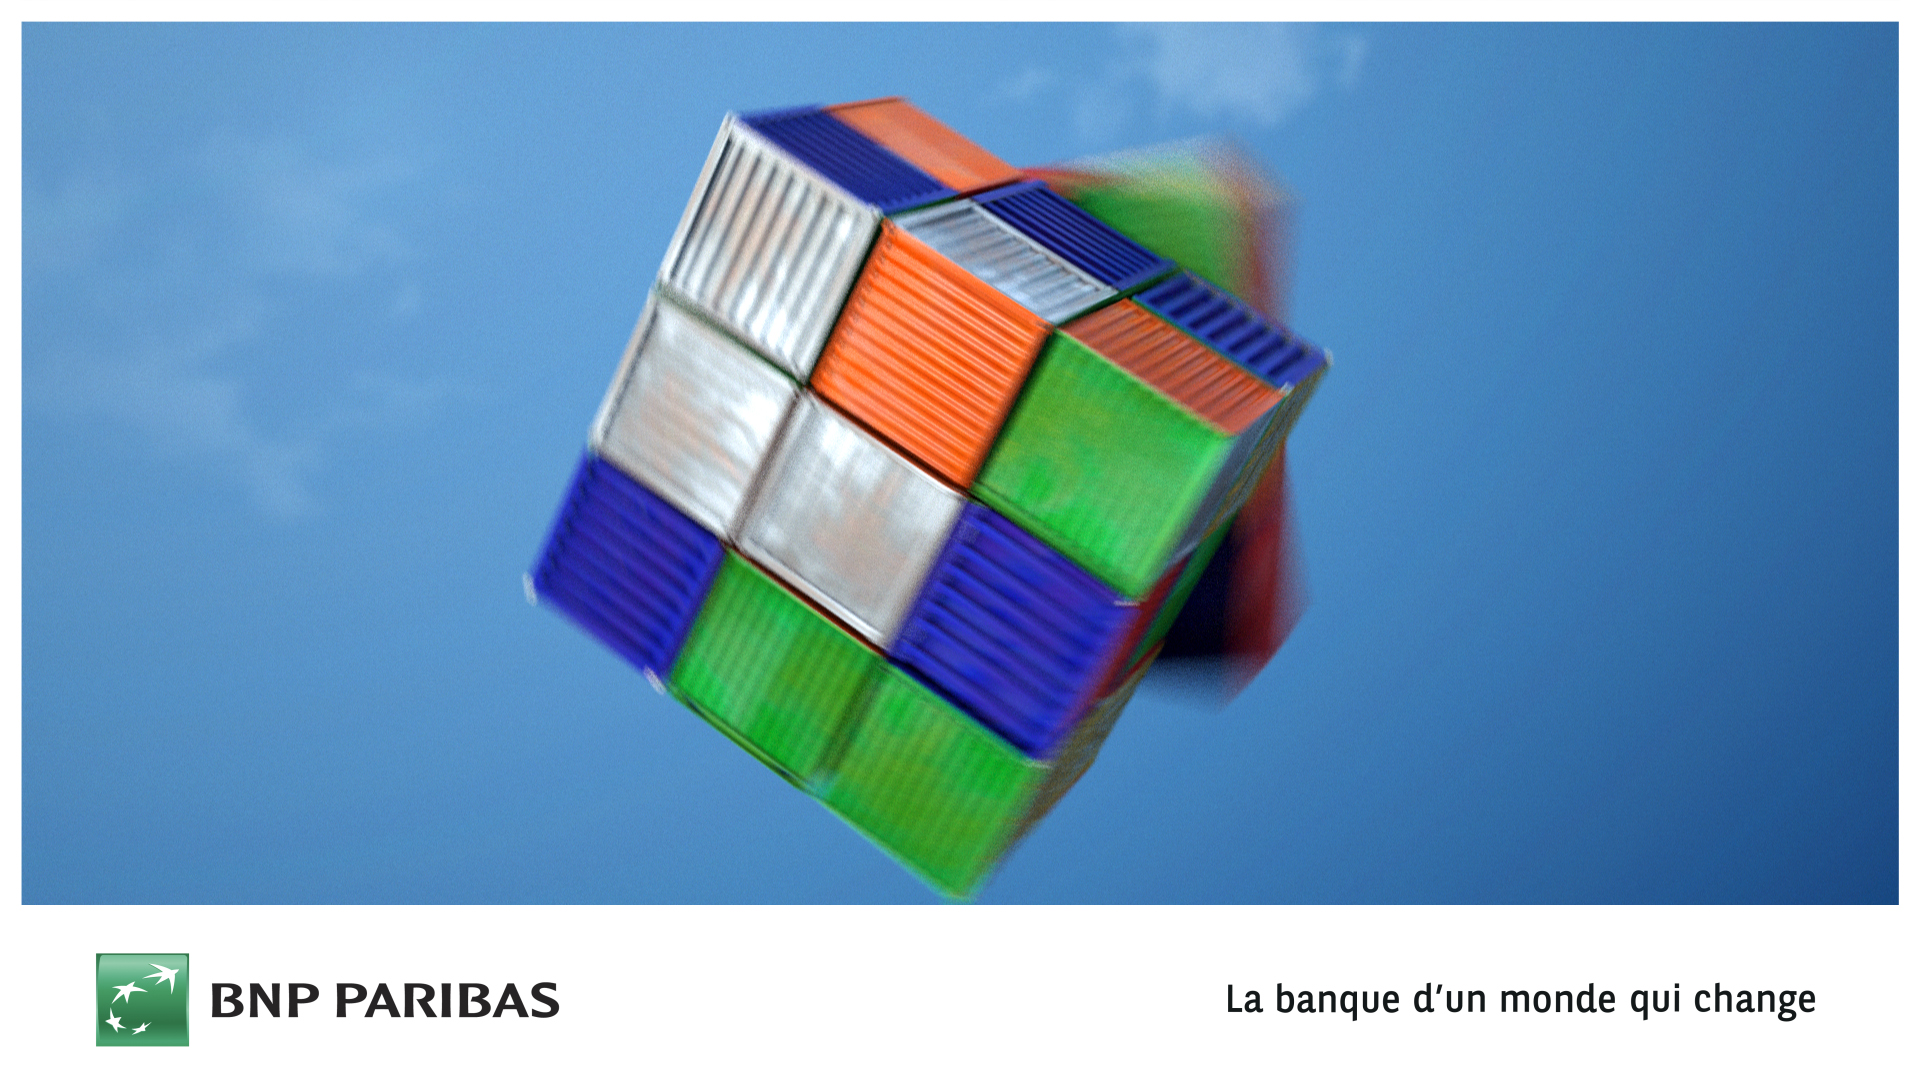 http://ftptwo.twosevenlab.com/site_twoseven/html5_videos/BNP_Digital_Rubicube_15s.jpg